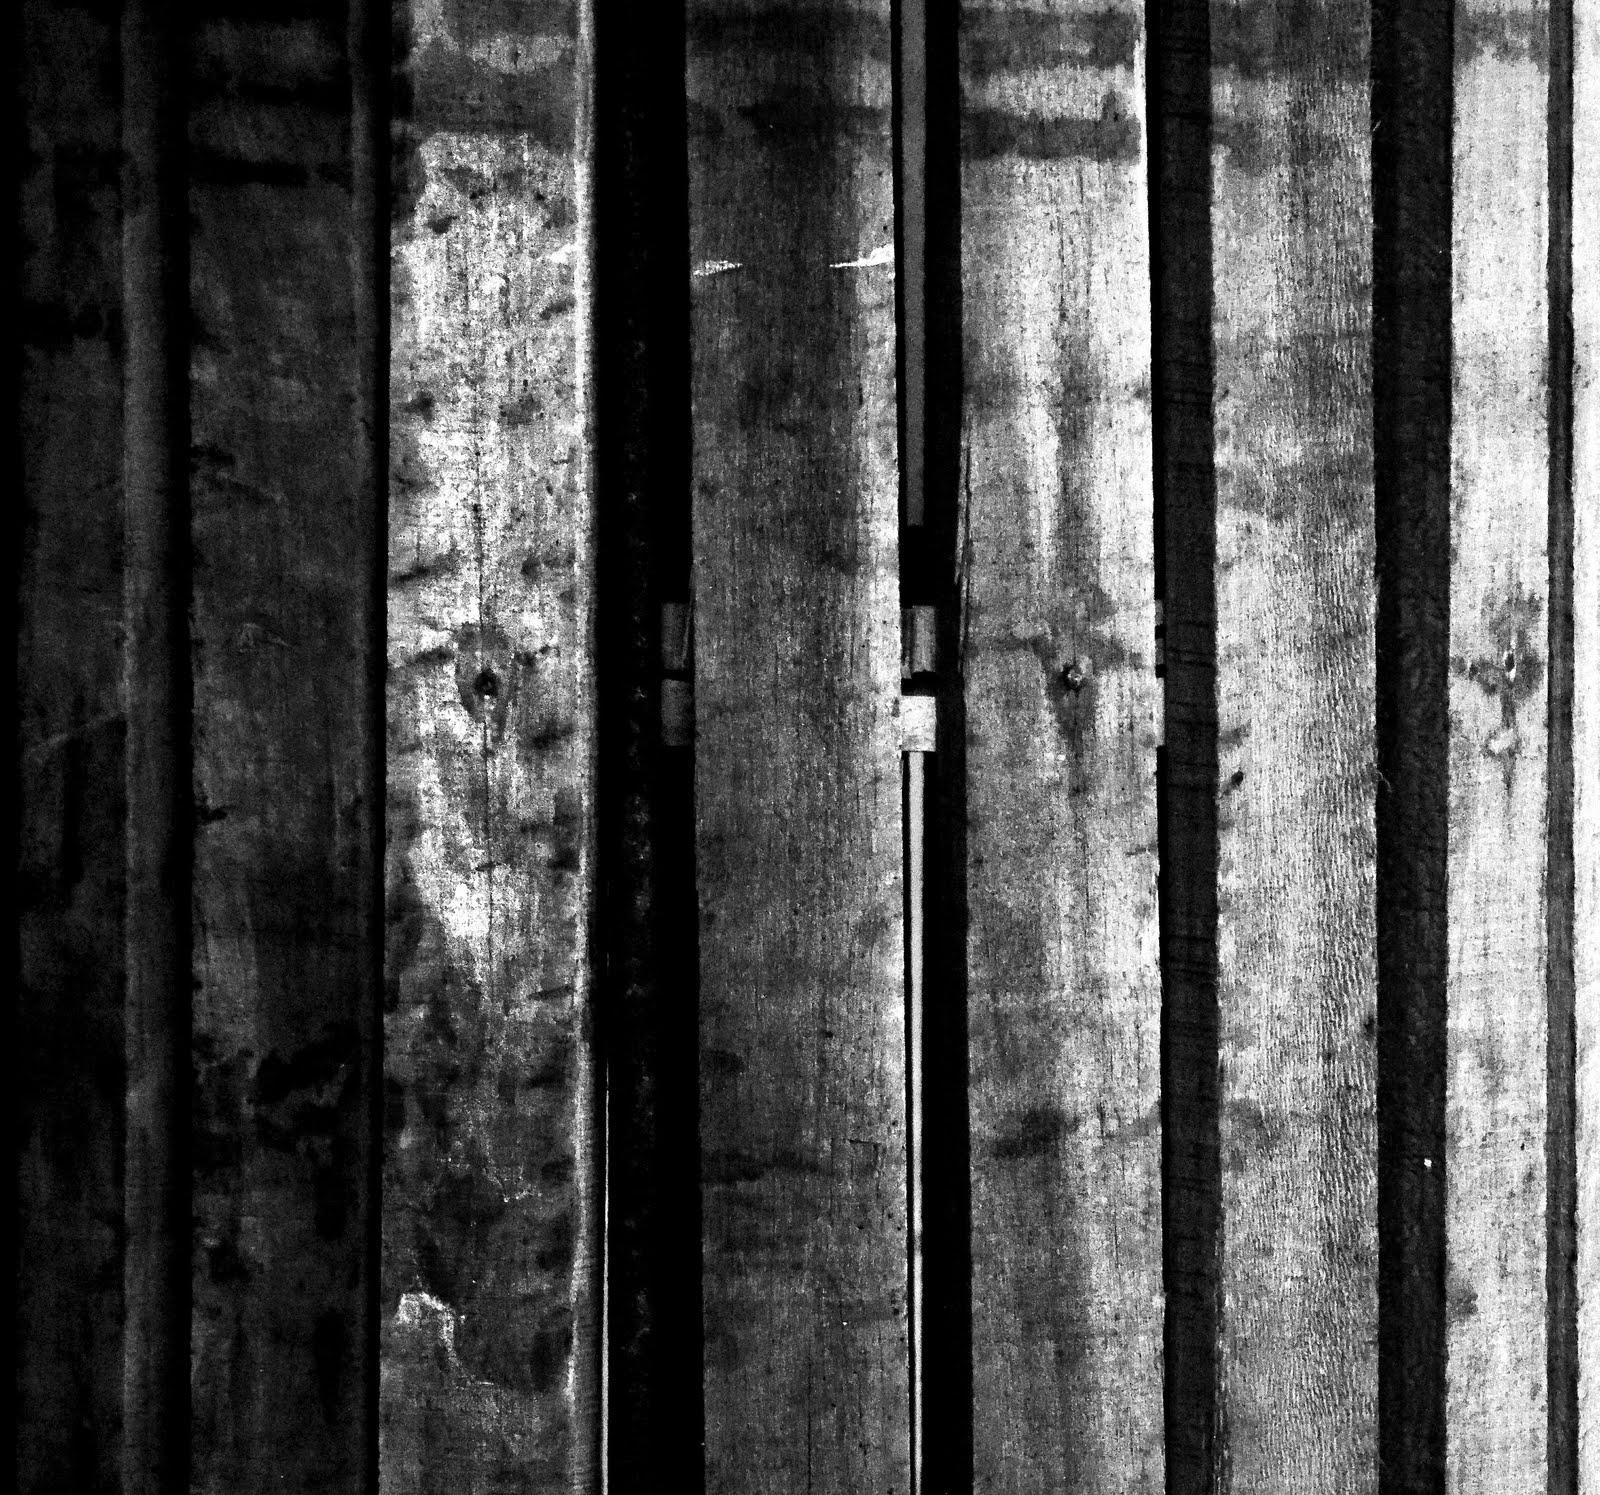 Vertical Line Art : Vertical line photography pixshark images